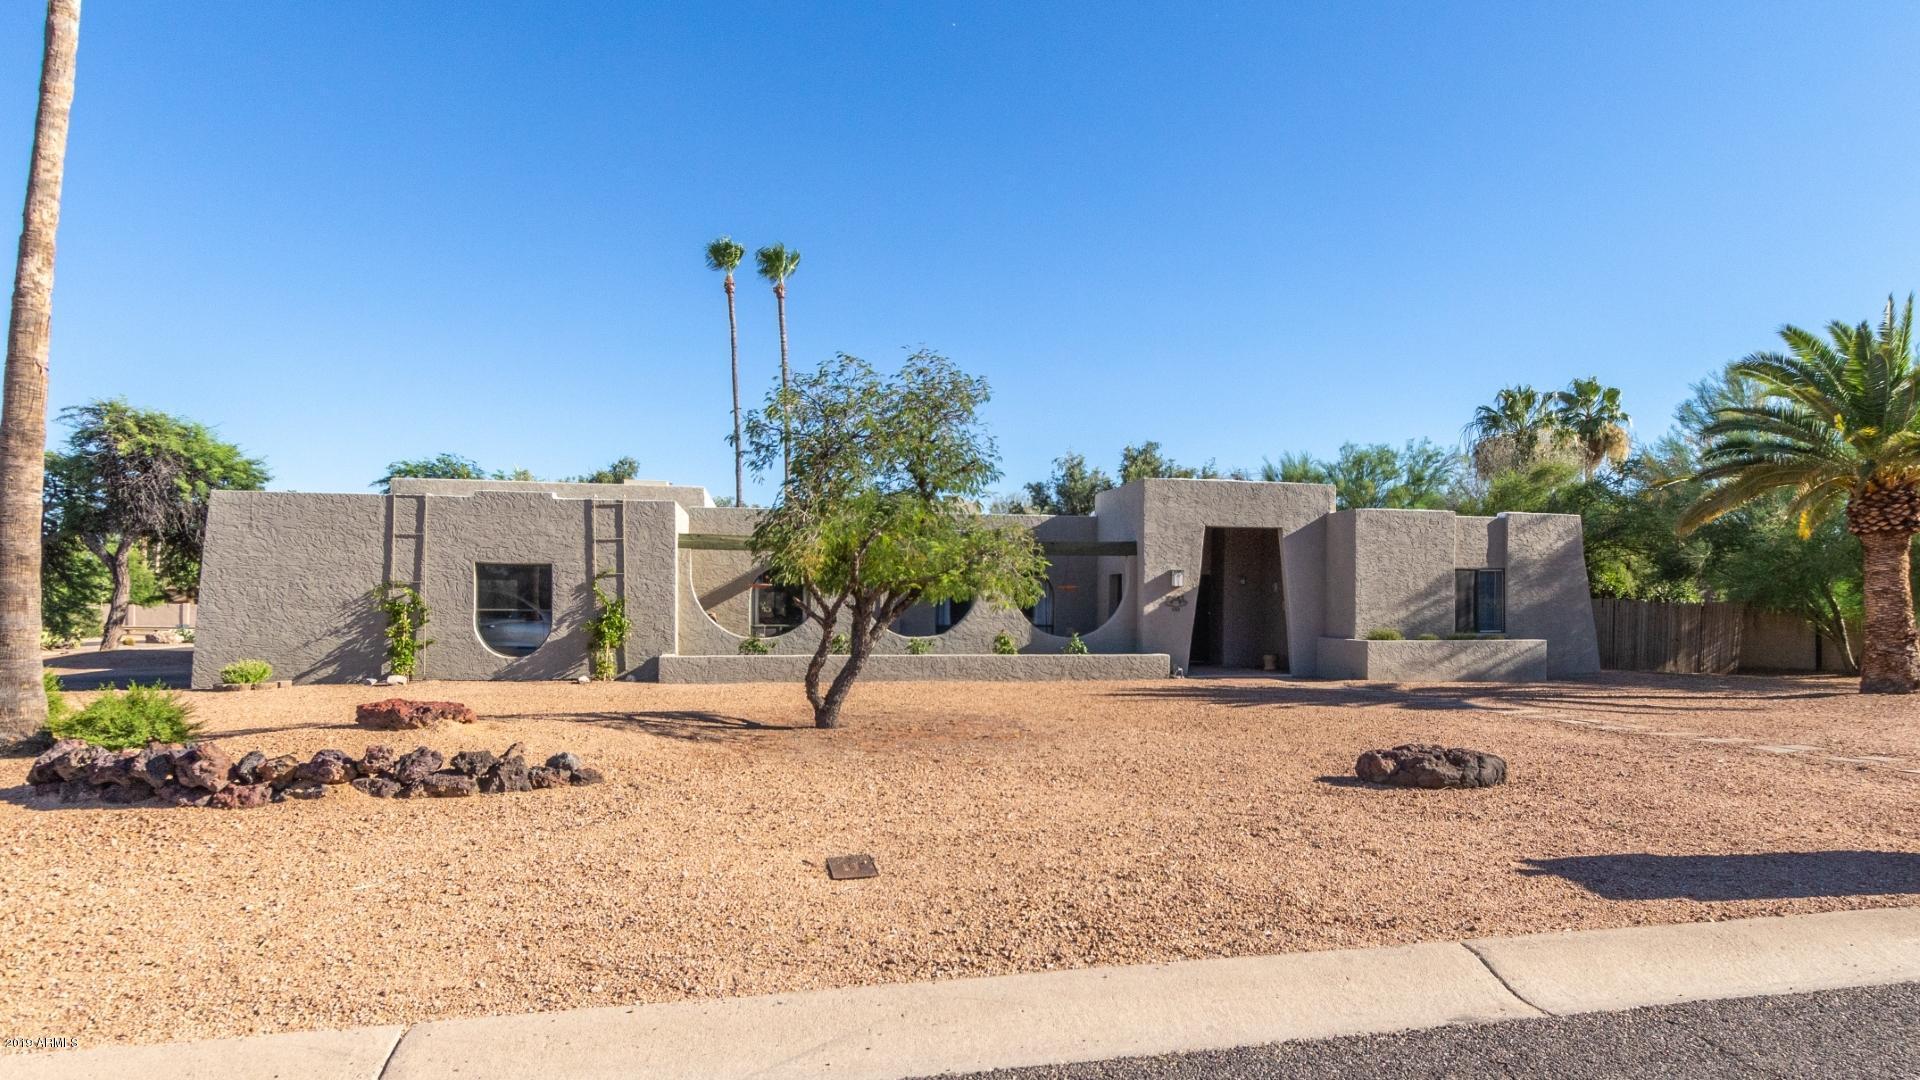 8043 E GRAY Road, Scottsdale AZ 85260